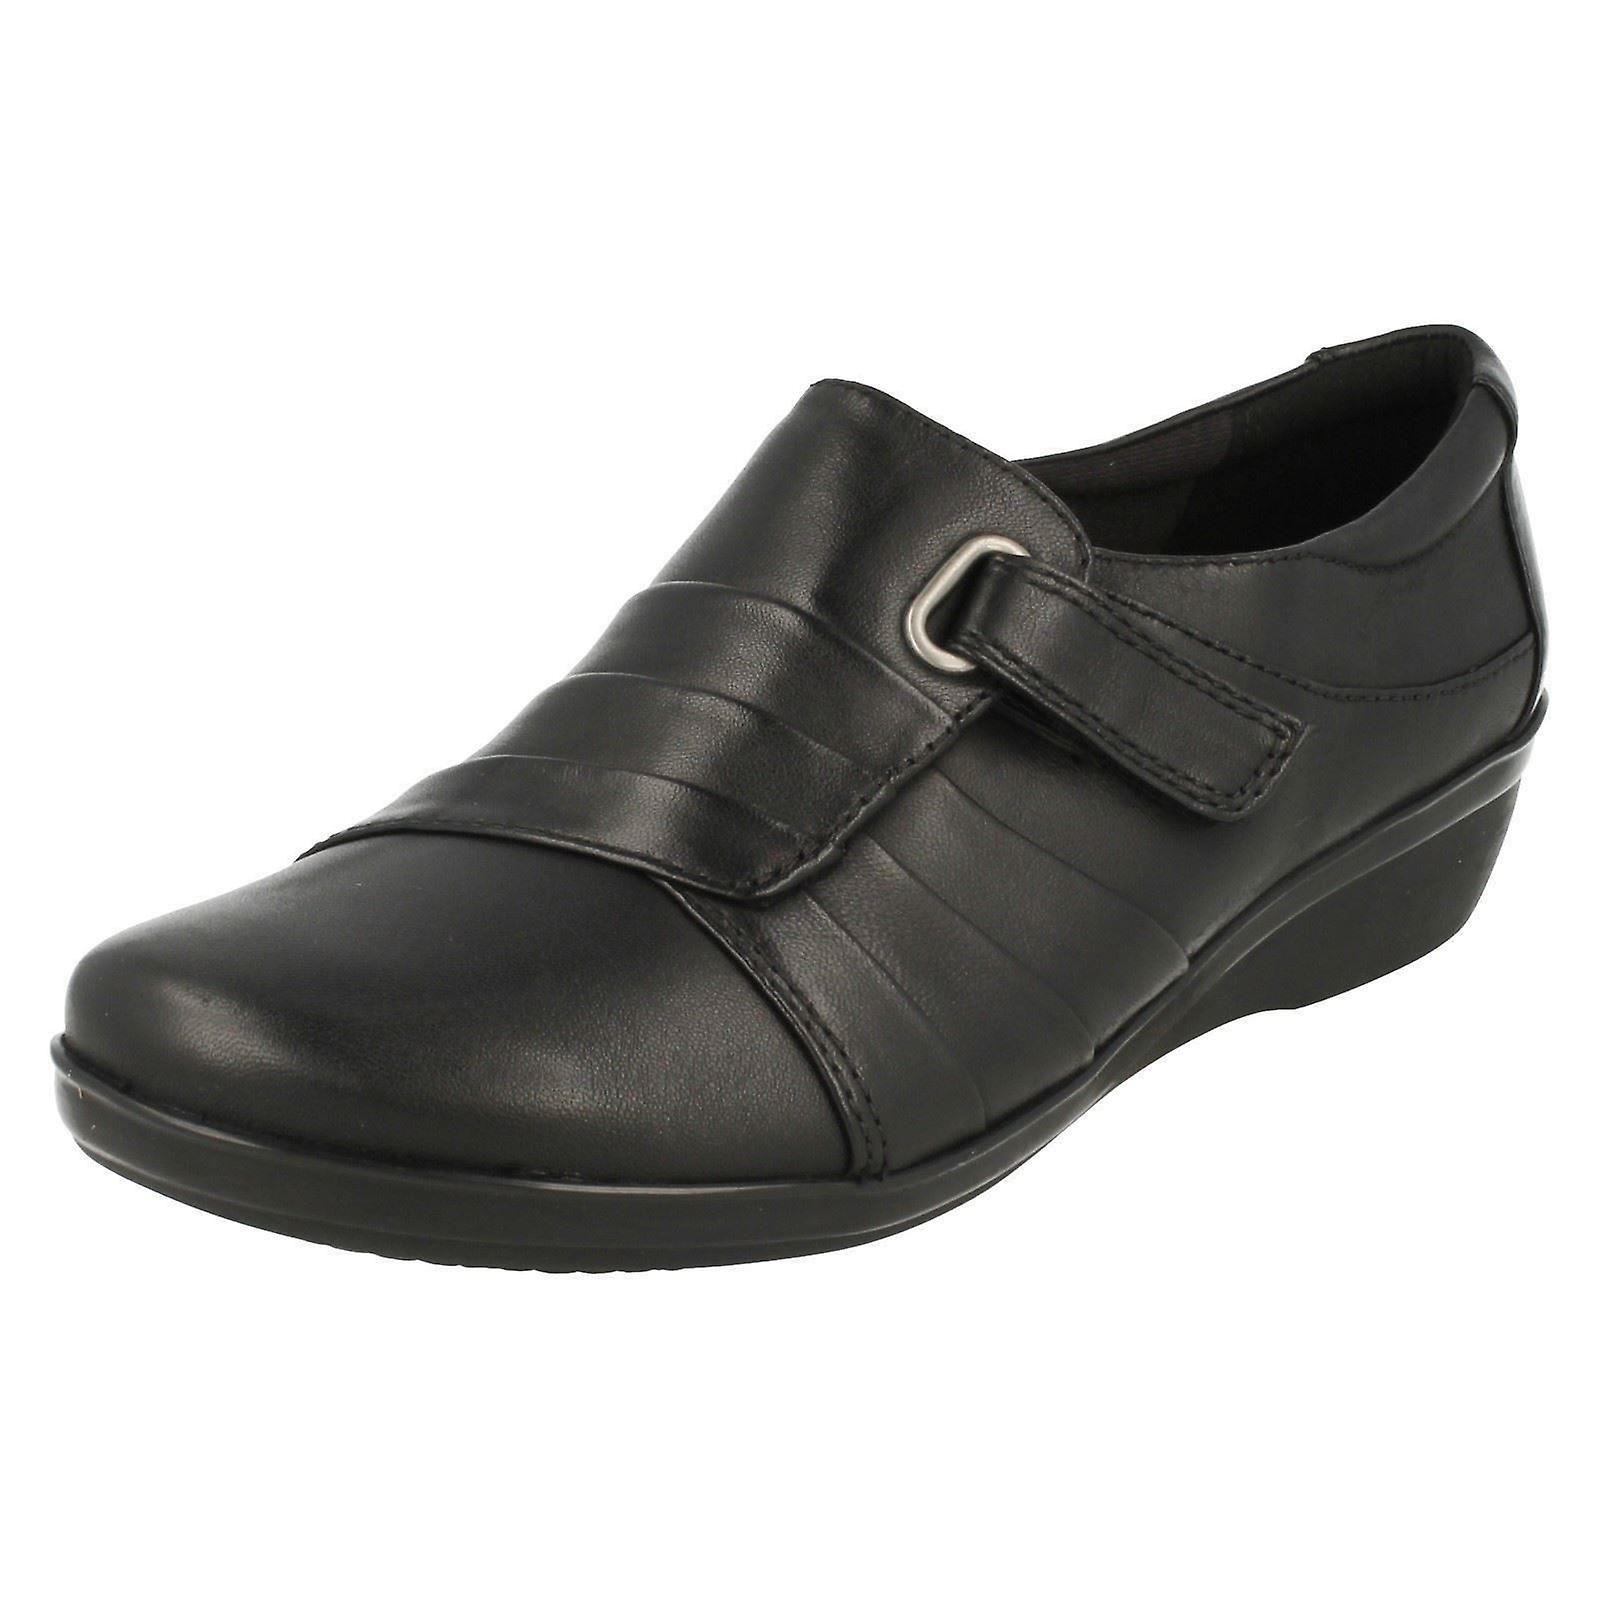 Ladies Clarks Low Wedge Smart Shoes Everlay Luna Eo95t